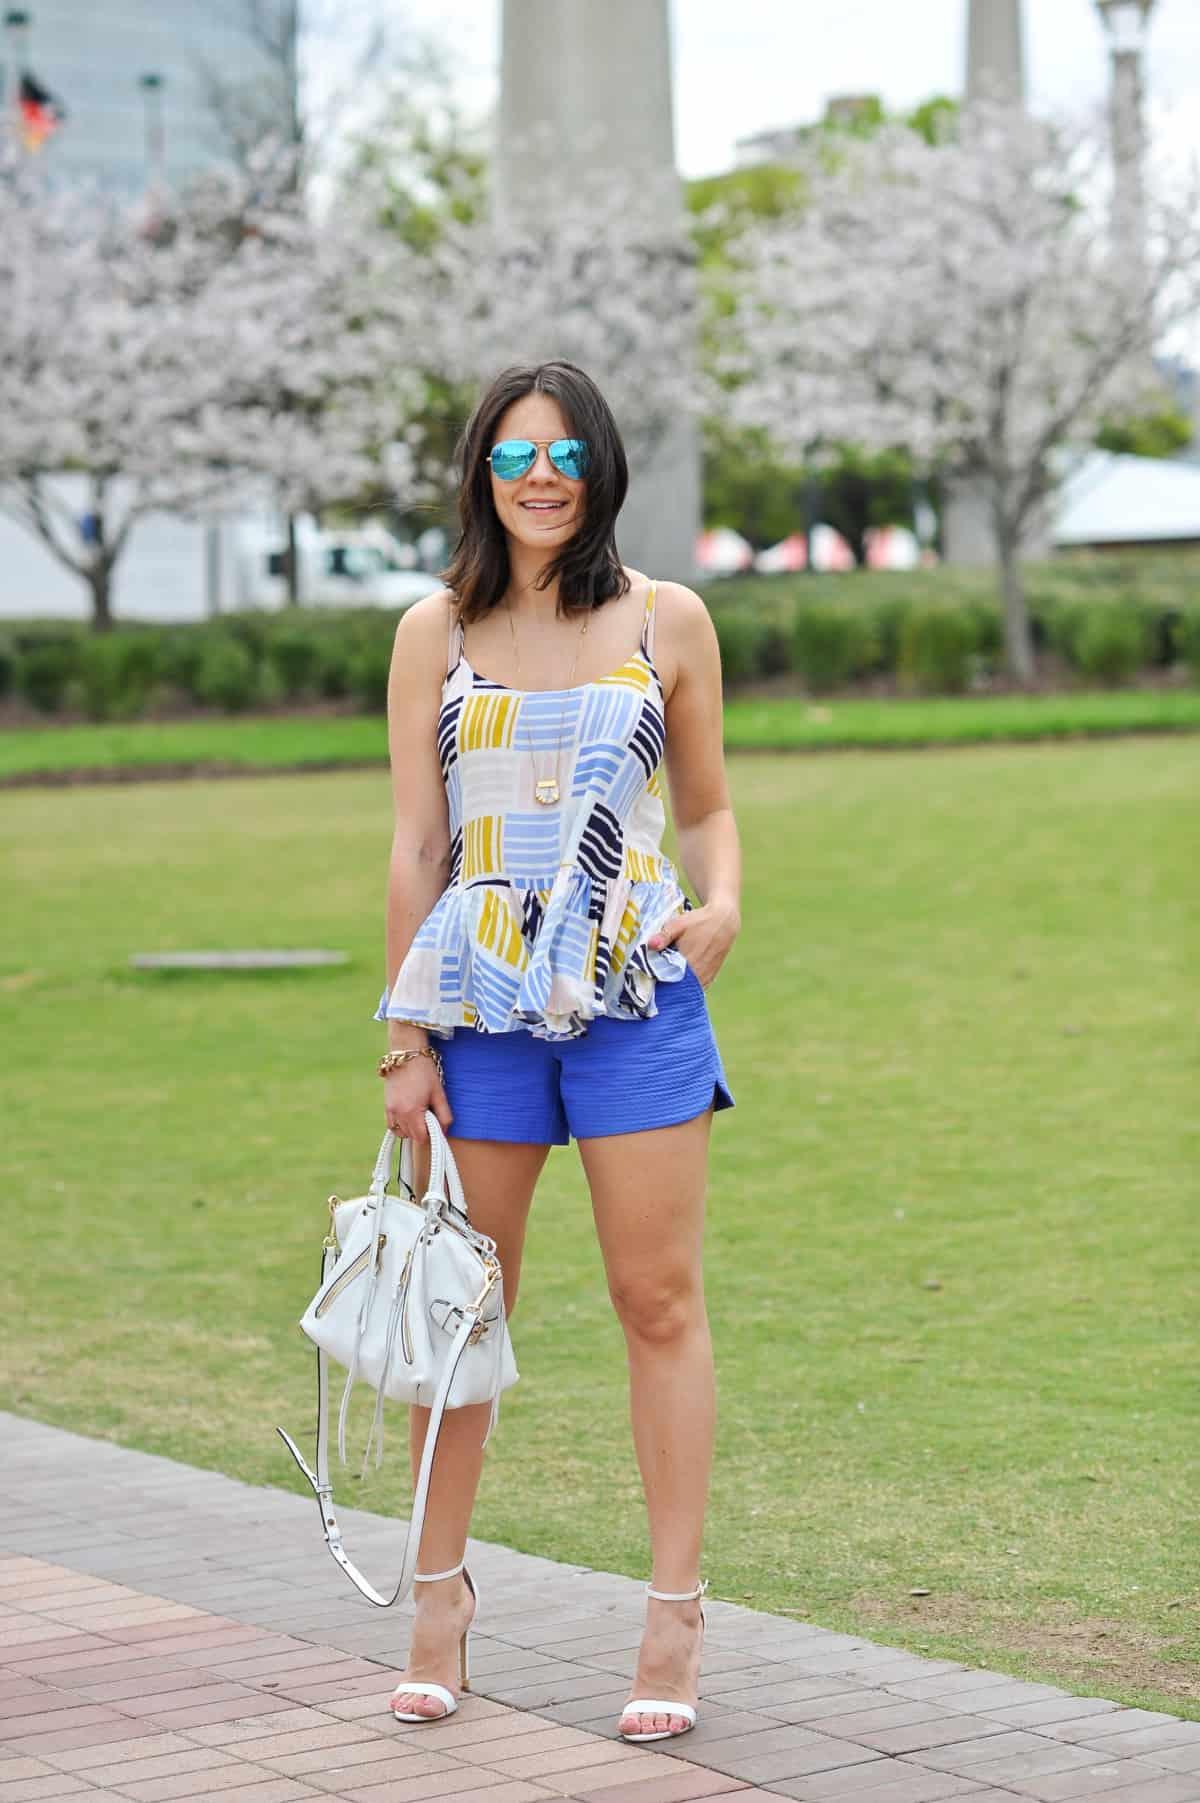 Old Navy printed peplum tank - summer outfit ideas - My Style Vita - @mystylevita - 1